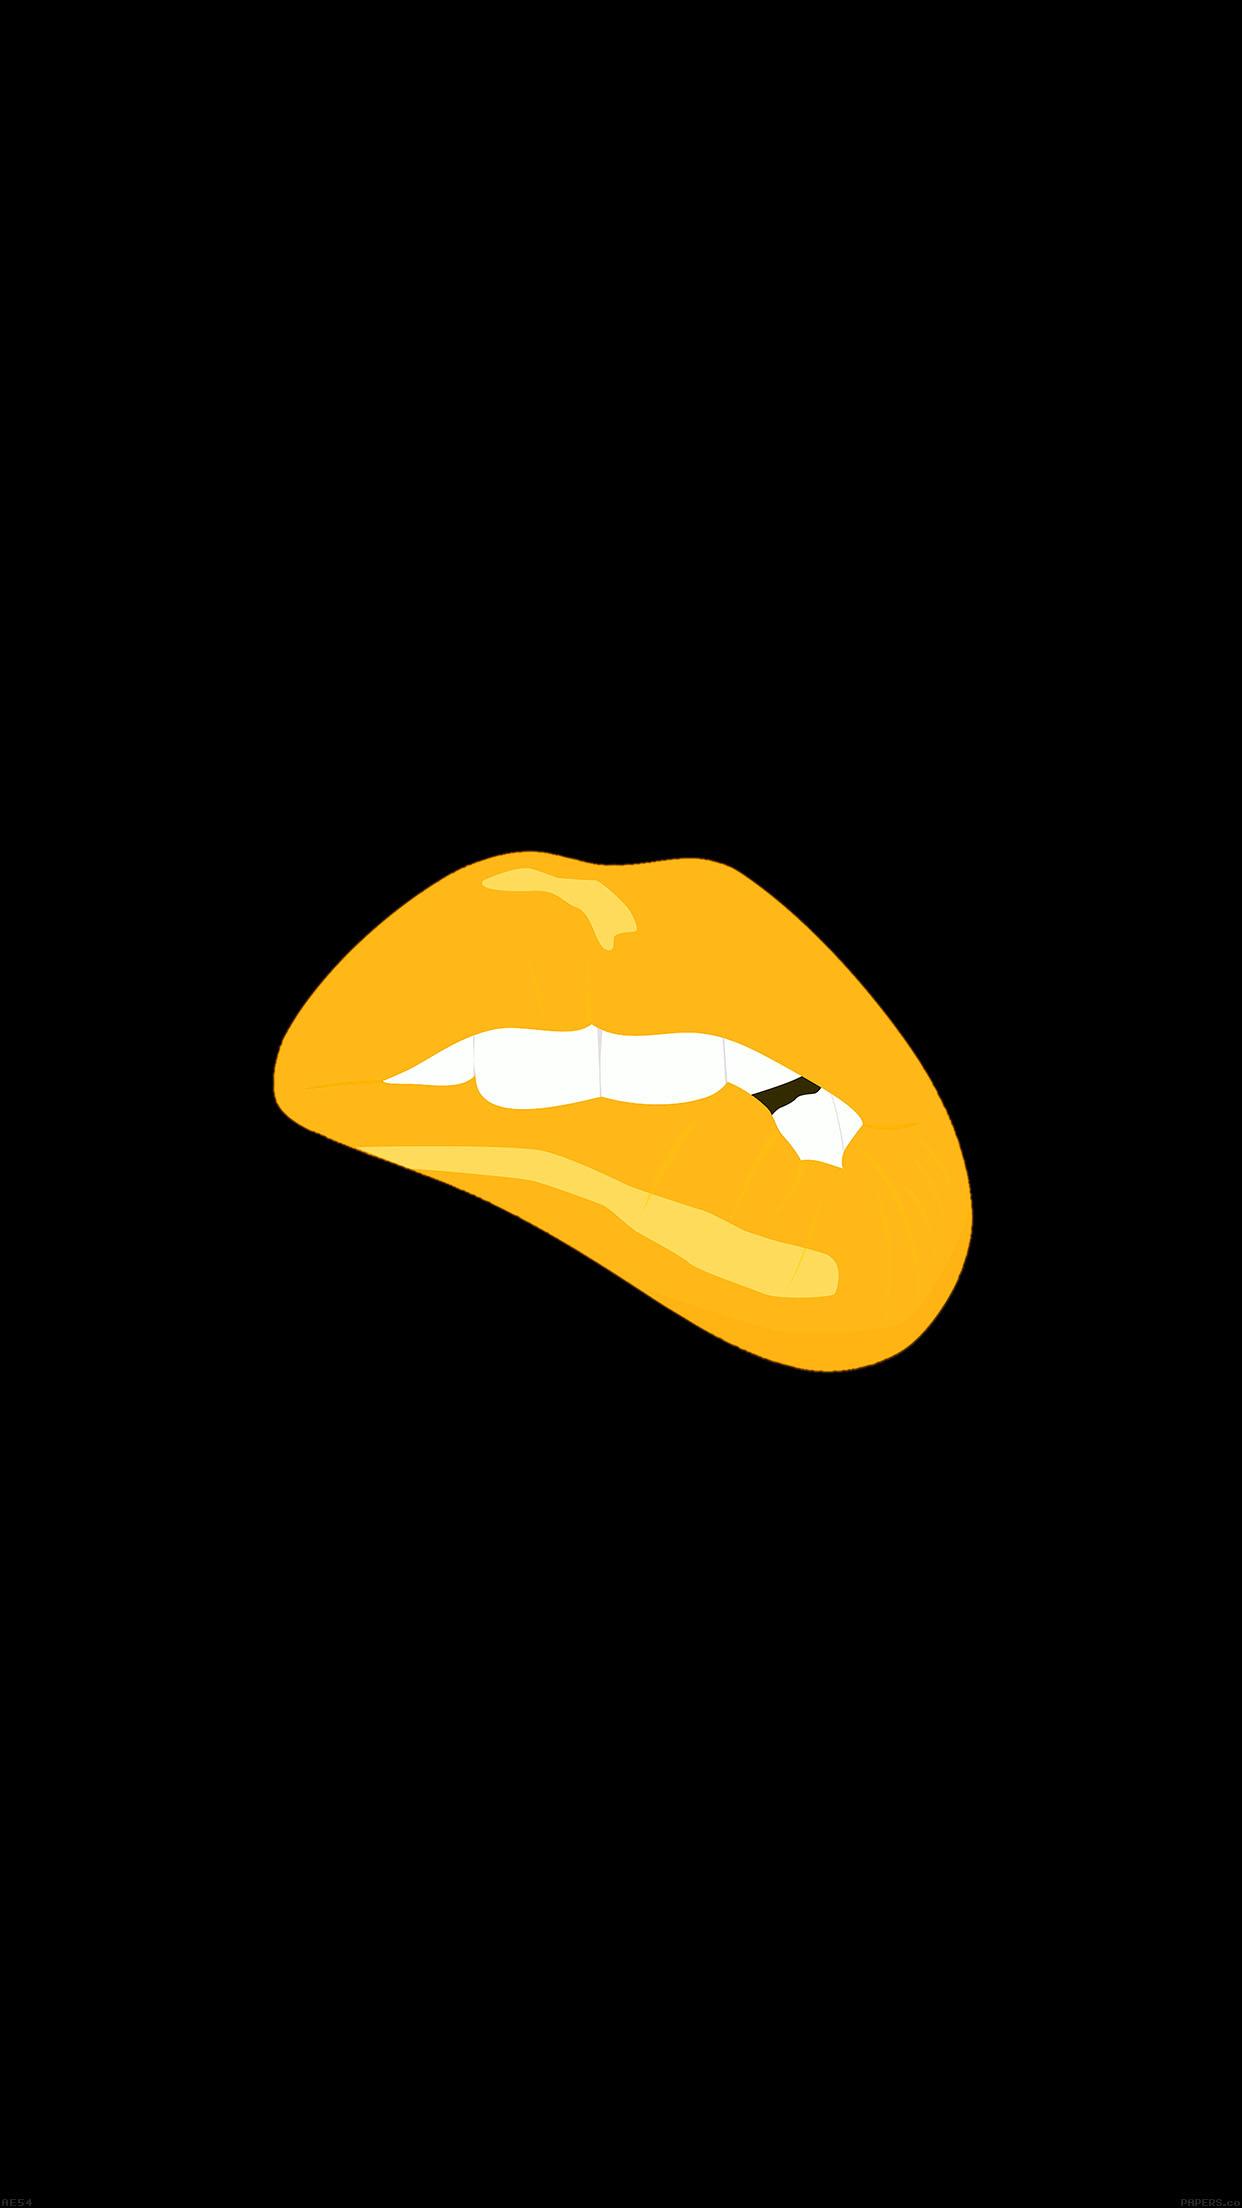 Black And Yellow Wallpaper Phone 1242x2208 Wallpaper Teahub Io